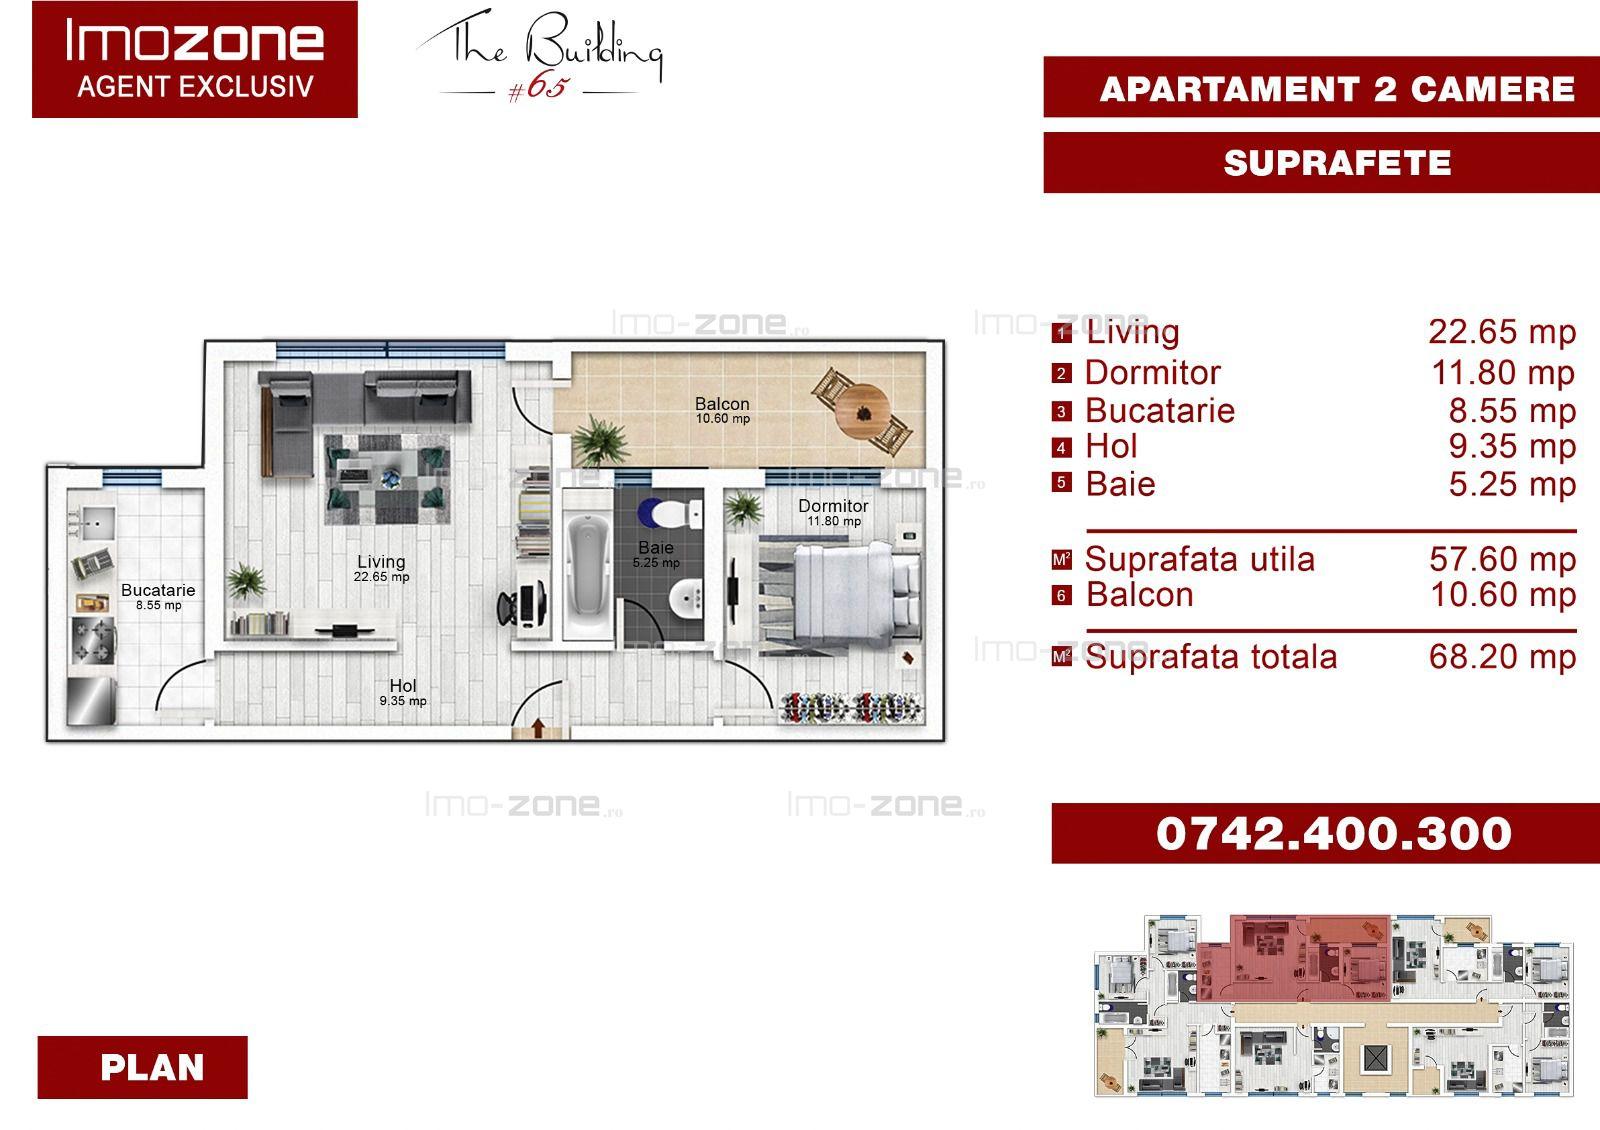 Apartament 2 camere, decomandat, 73 mp.S.U, finisat modern, metrou, comision 0%